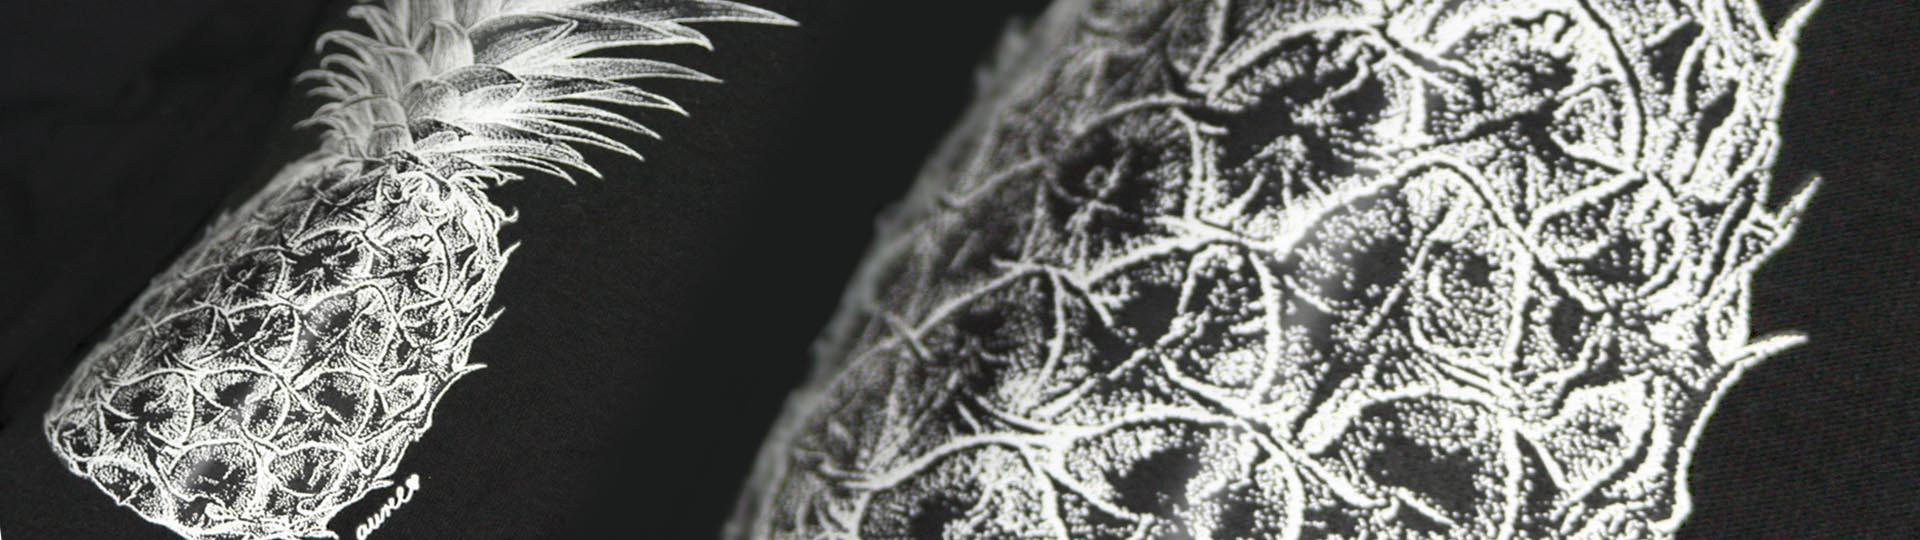 TRANSFERT MONOCOULEUR - image 6